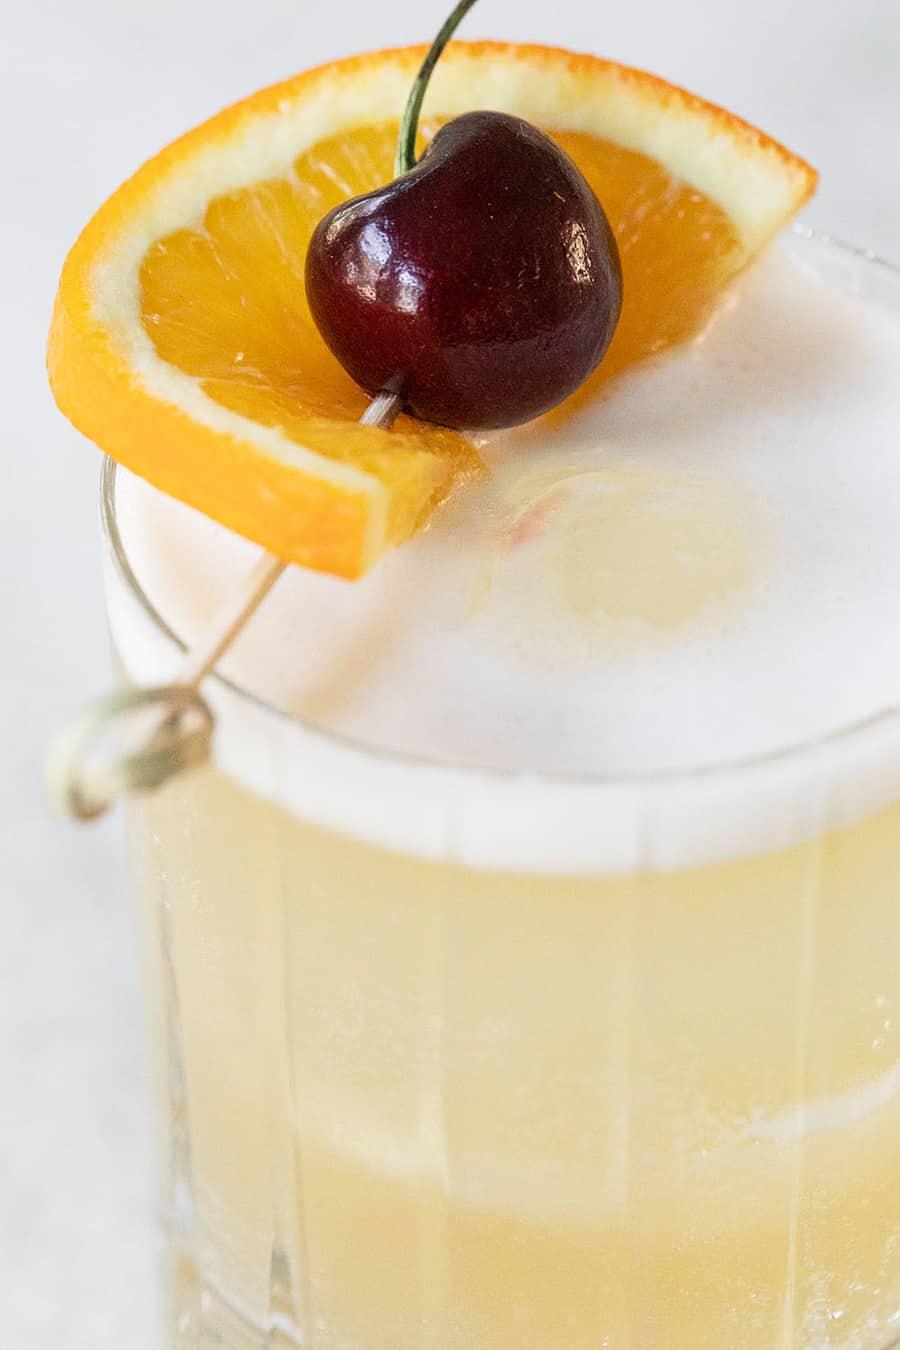 Cherry and orange slice garnish on a whiskey sour